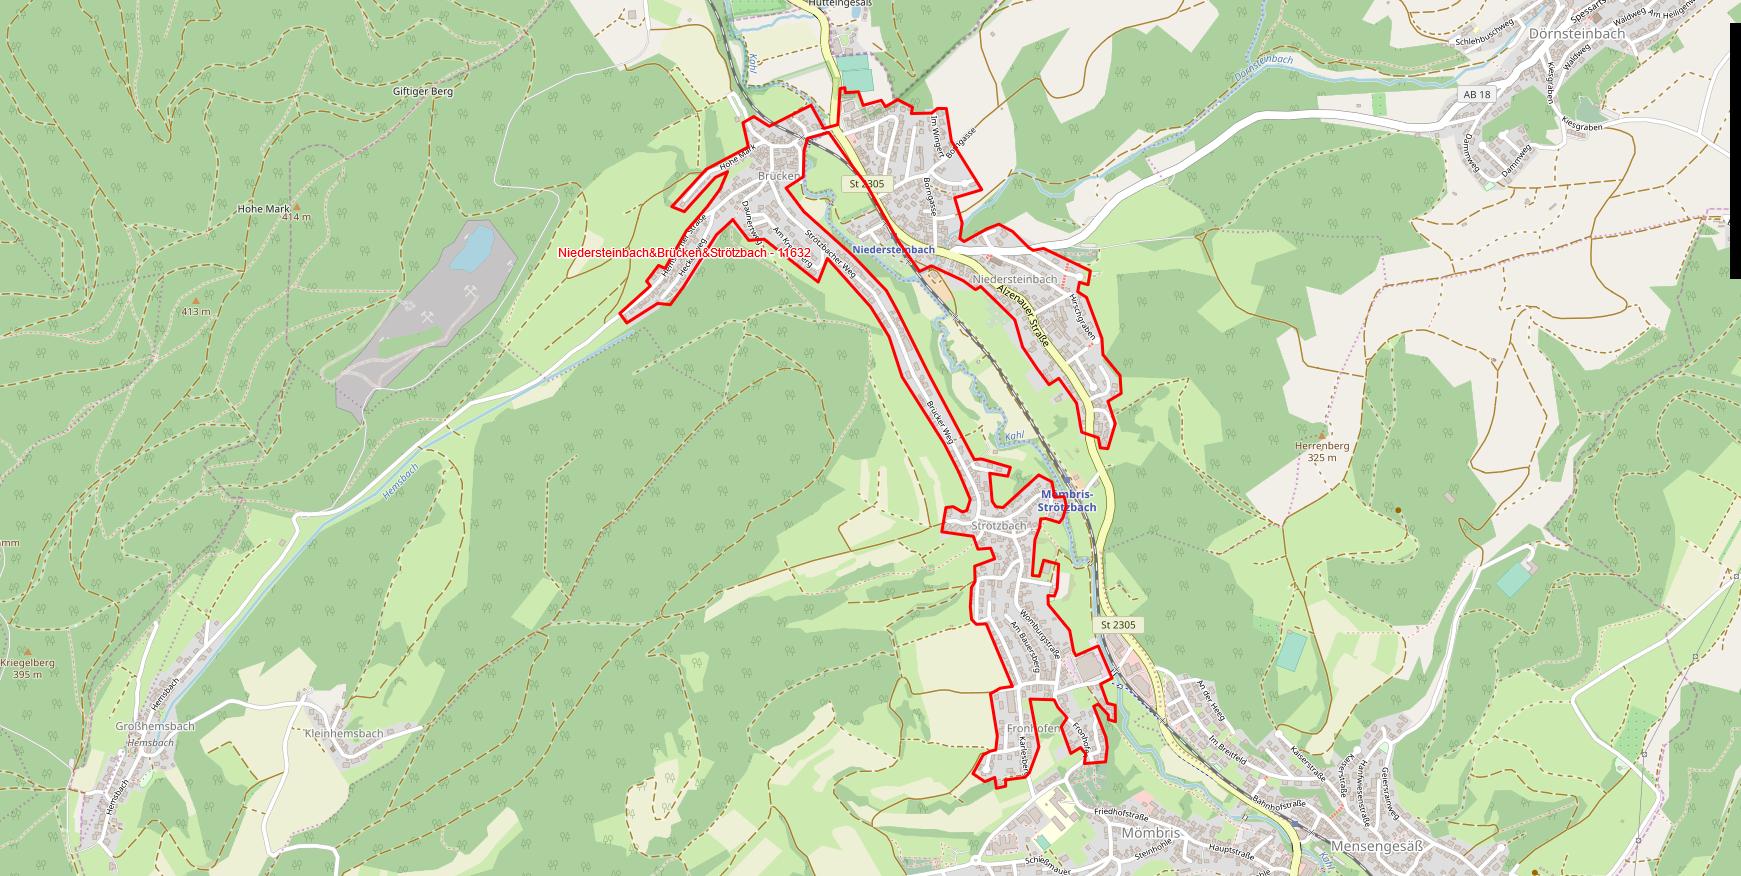 Niedersteinbach / Brücken / Strötzbach - Polygon